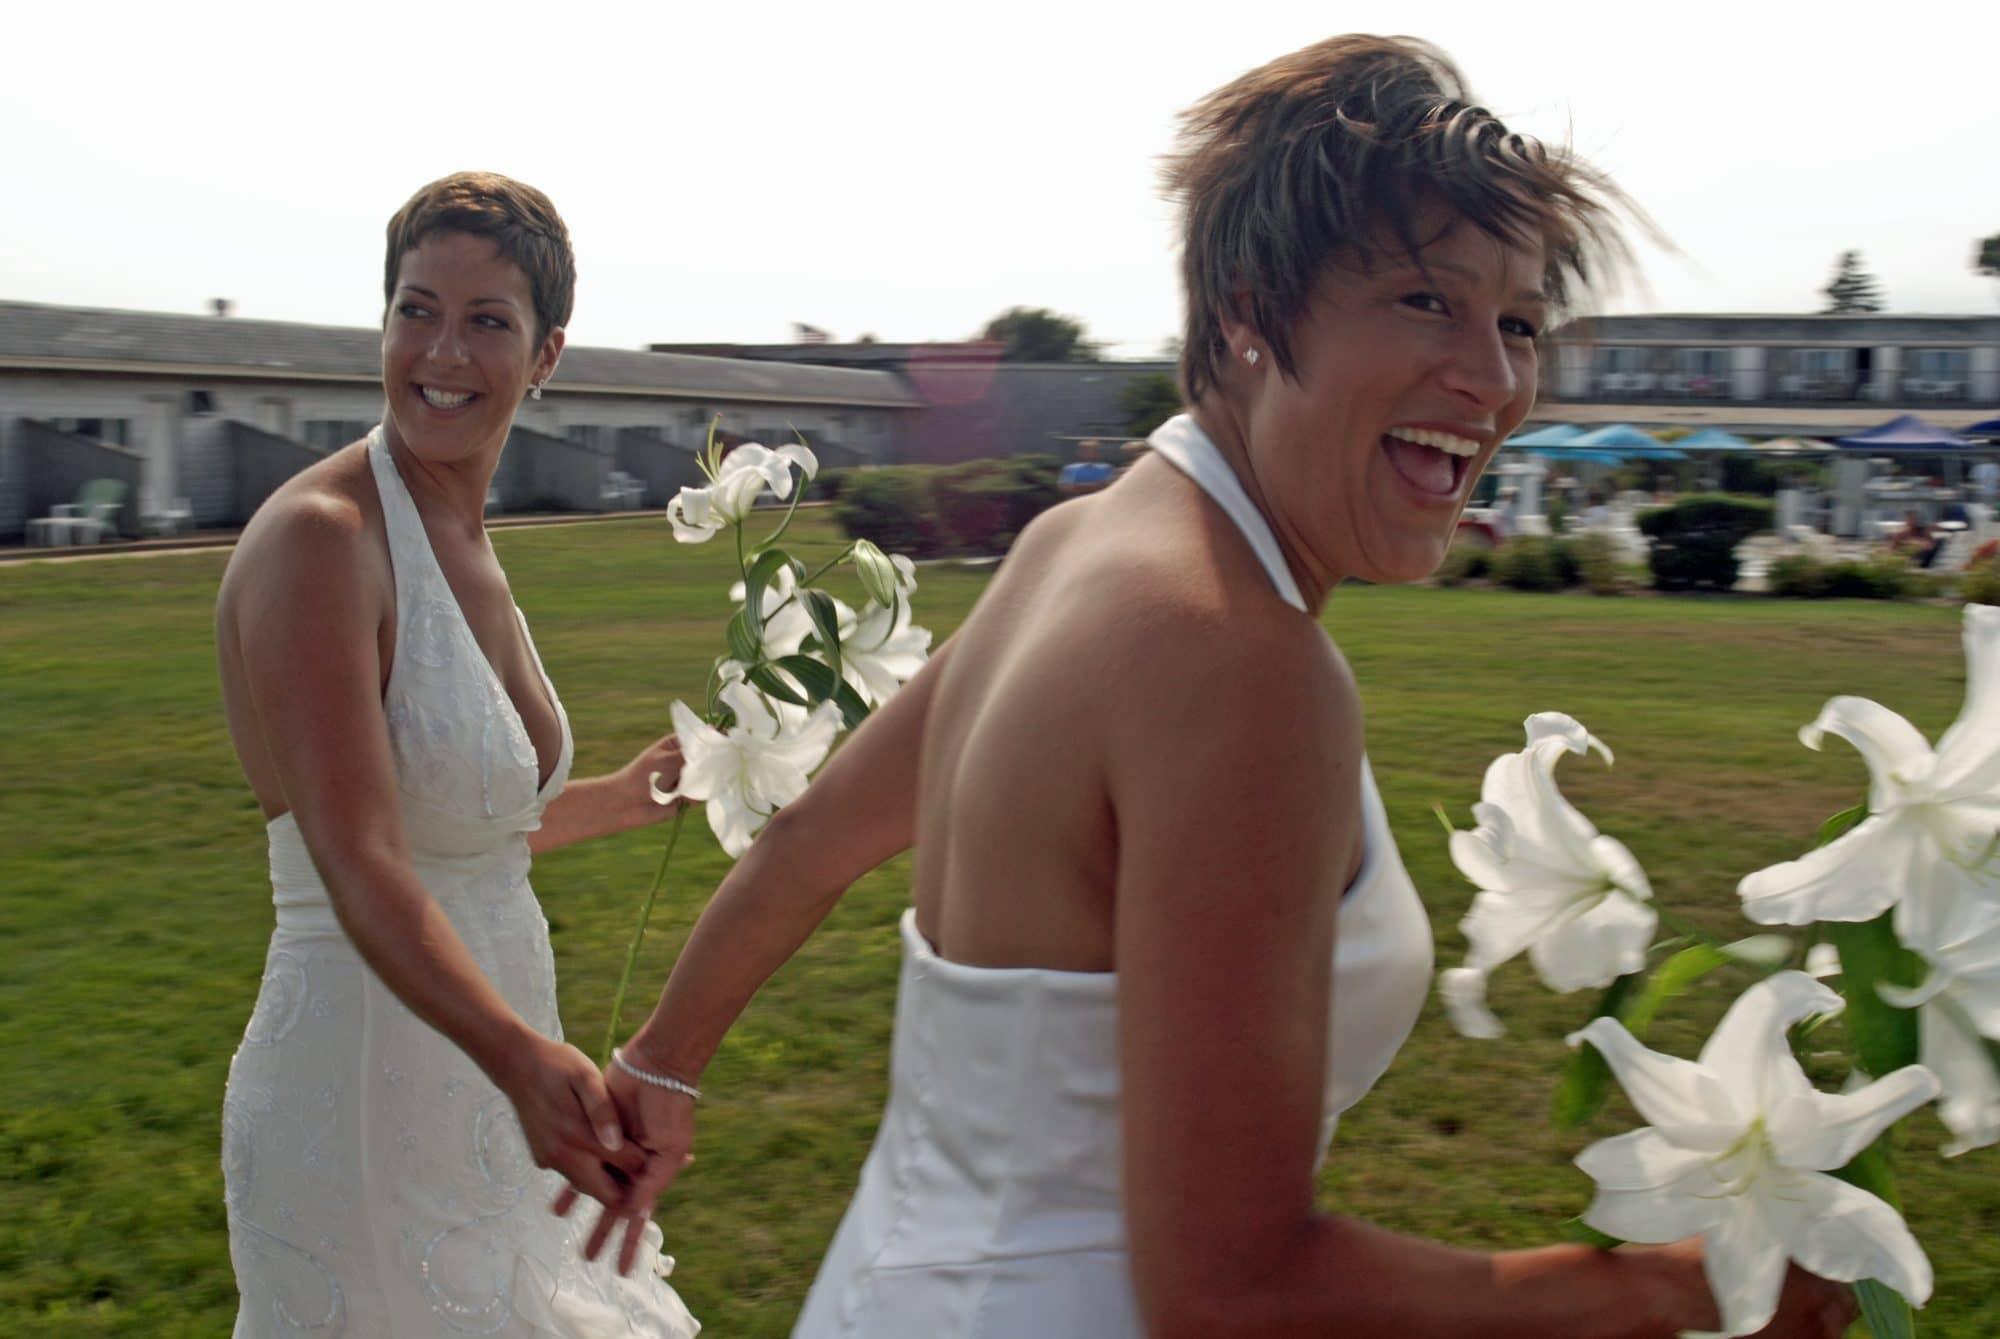 wedding pictures from kara k cd 1 093 (002)